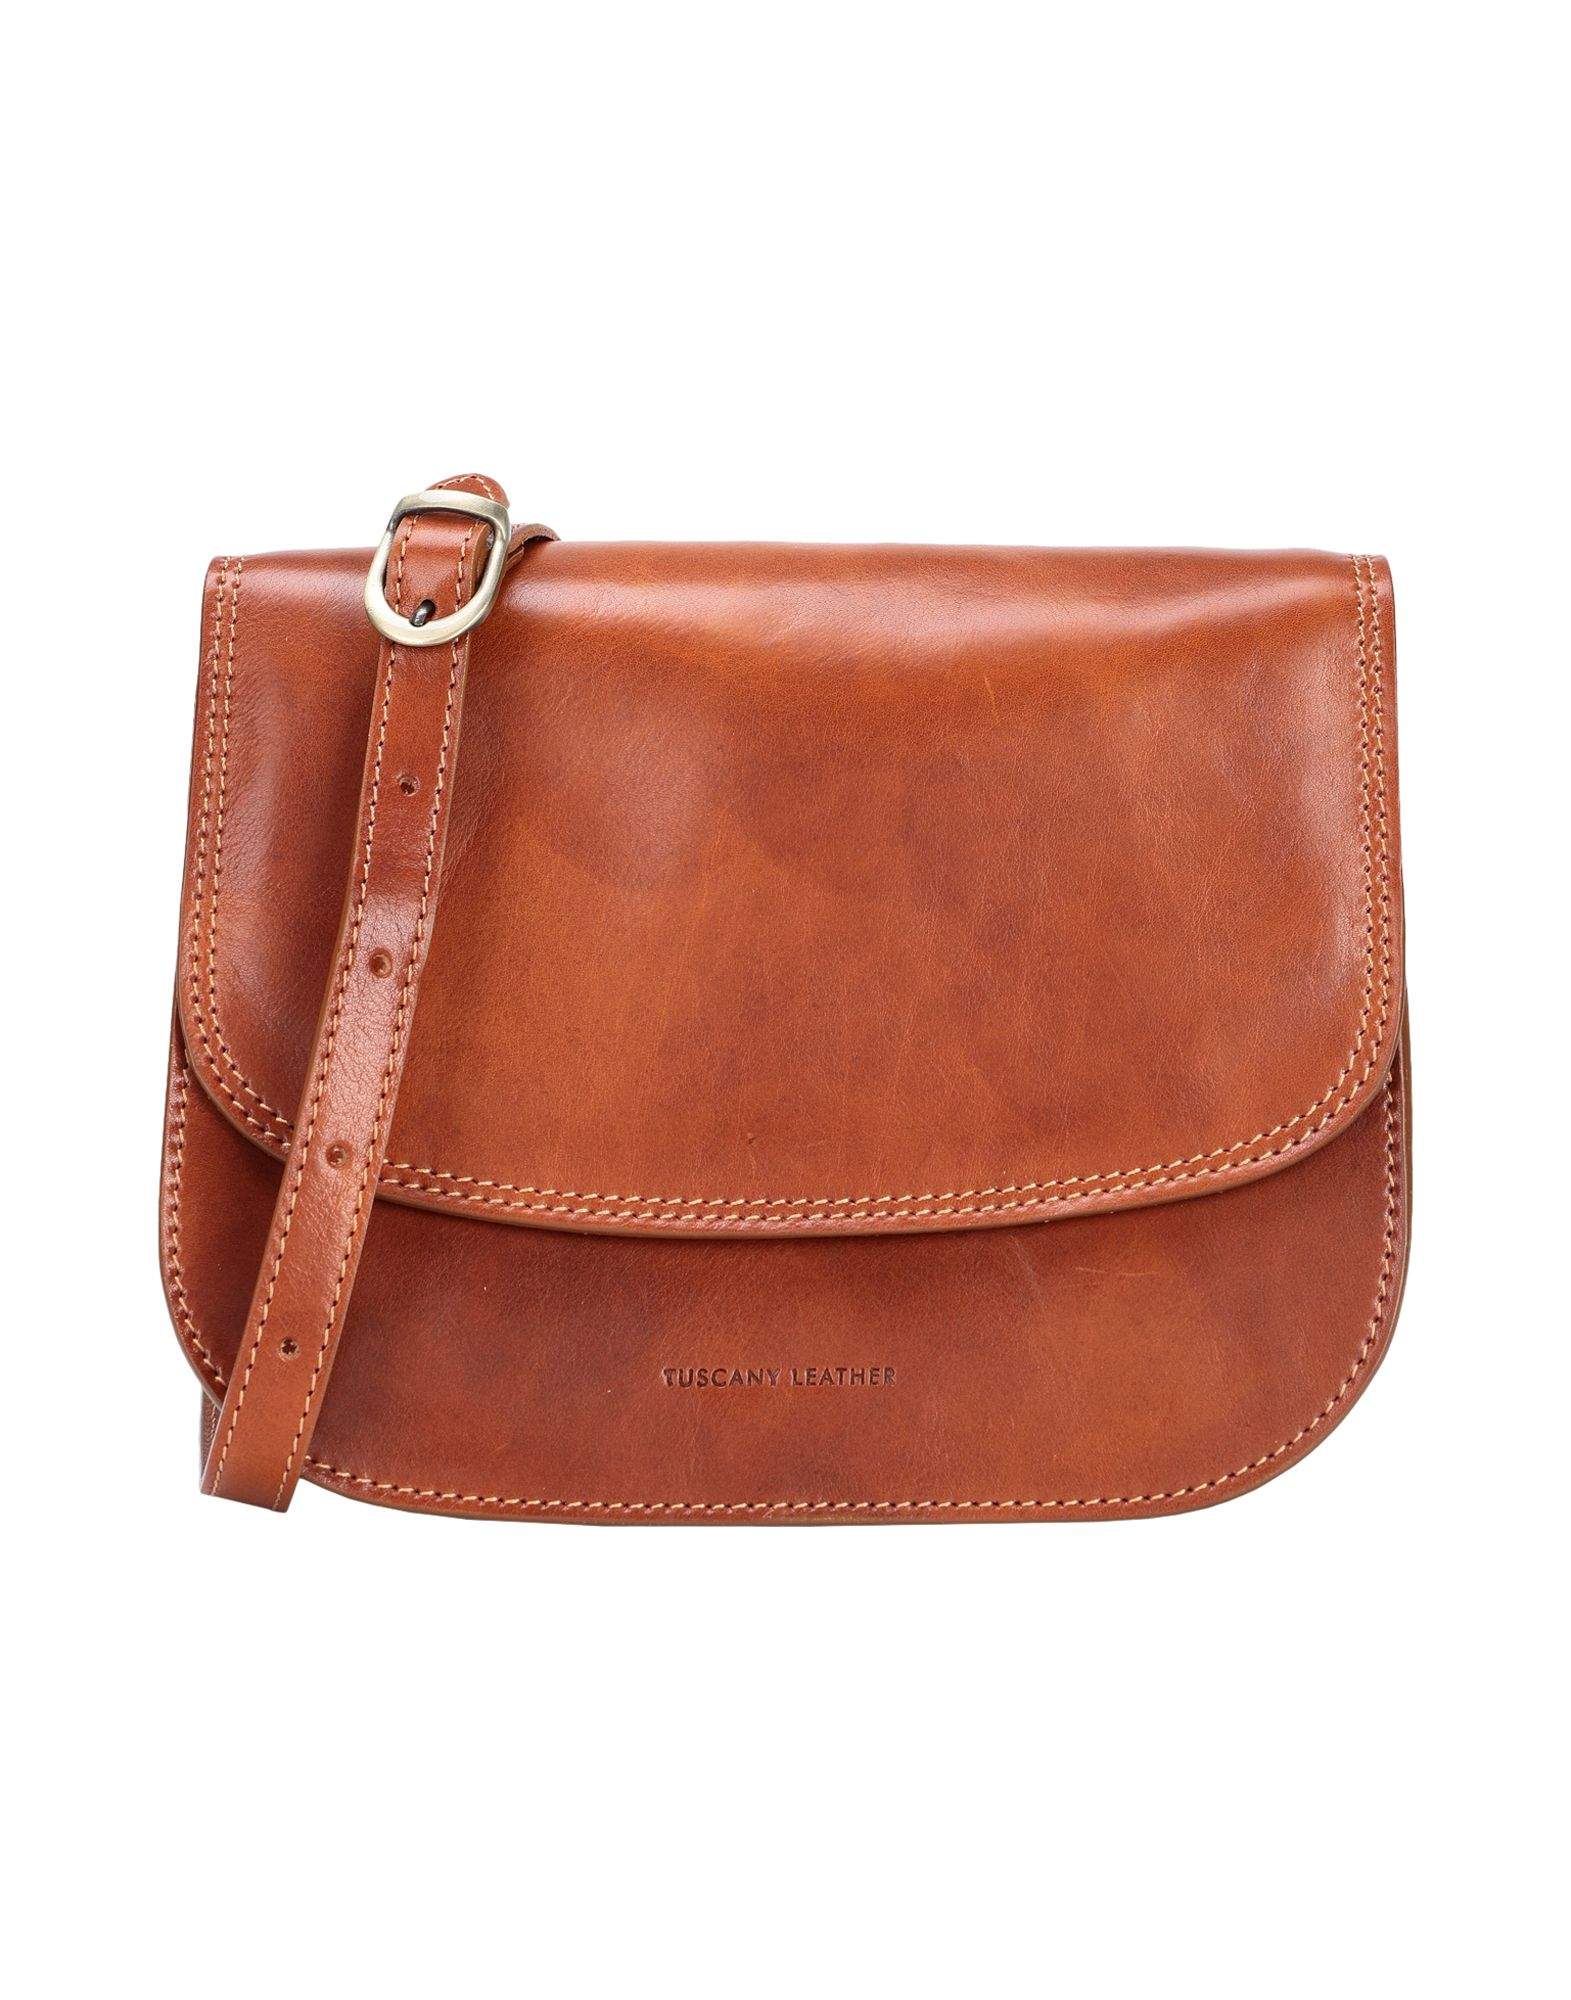 TUSCANY LEATHER Сумка через плечо кожаный портфель tuscany leather business tl141144 tl141144 коричневый